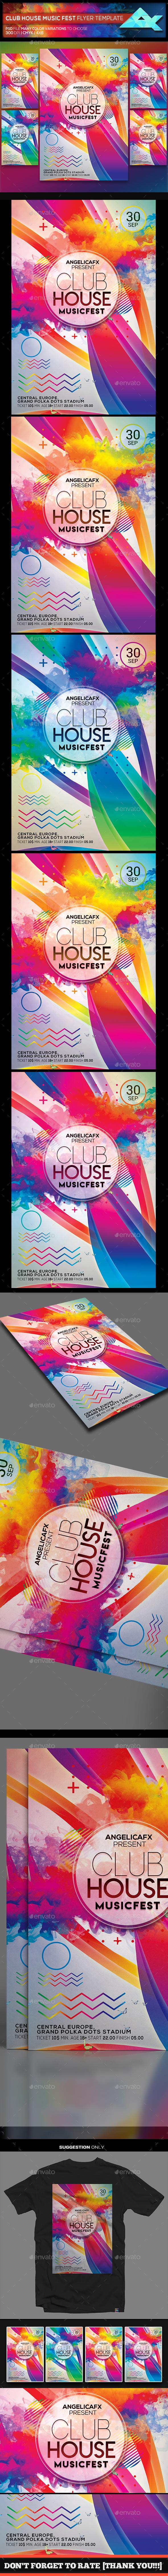 Club House Music Fest Flyer Template - Flyers Print Templates